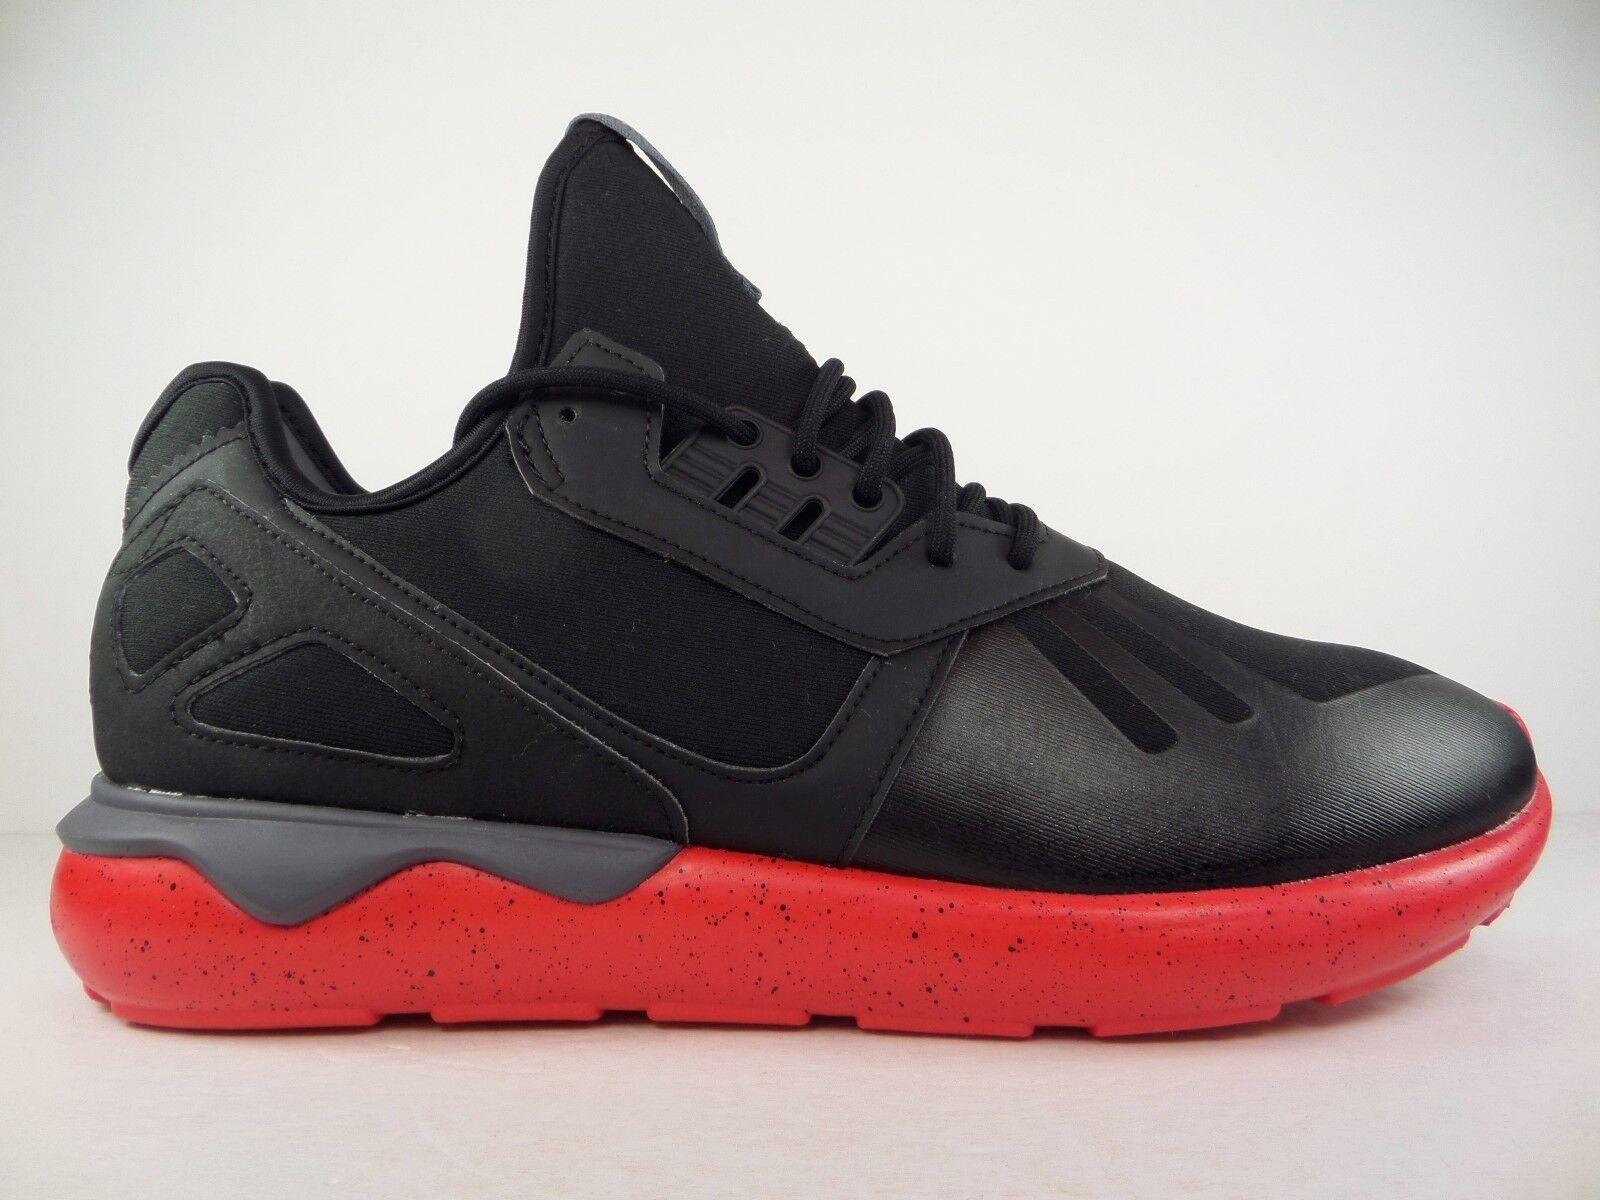 New Mens adidas Originals Tubular Runner Shoes 11.5 Black Tomato Onix AQ8387